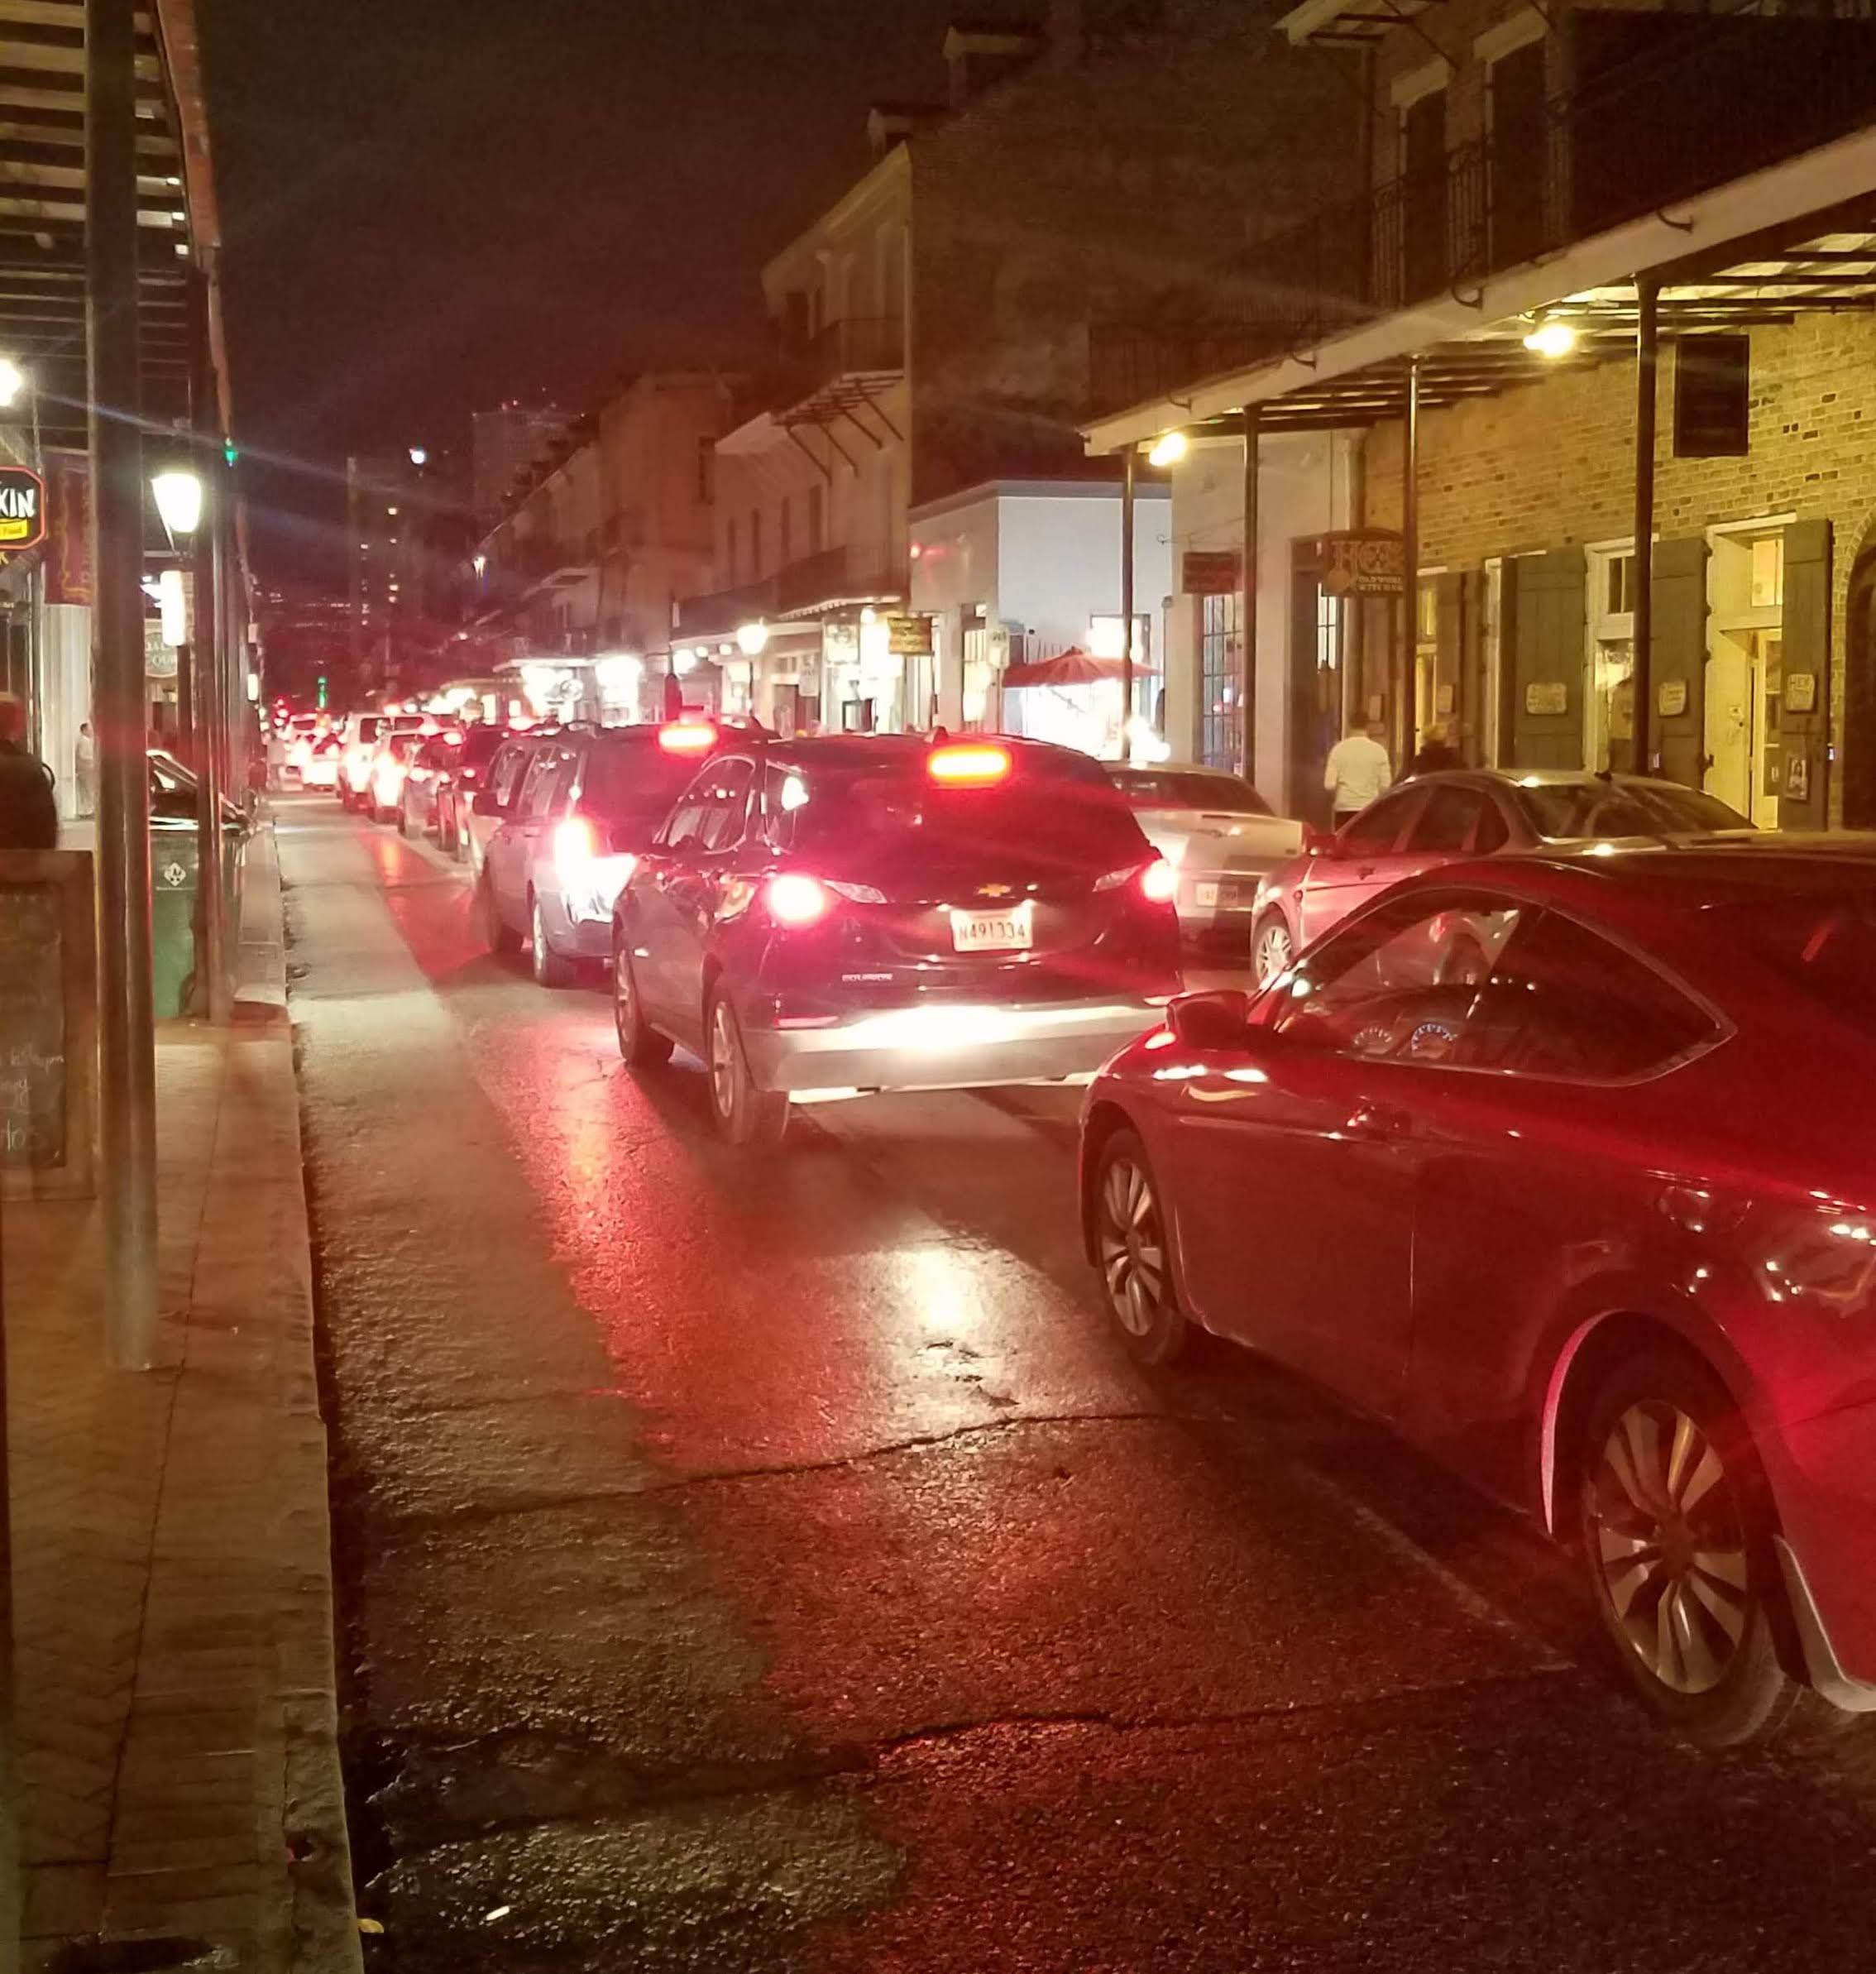 French Quarter traffic on a Friday night